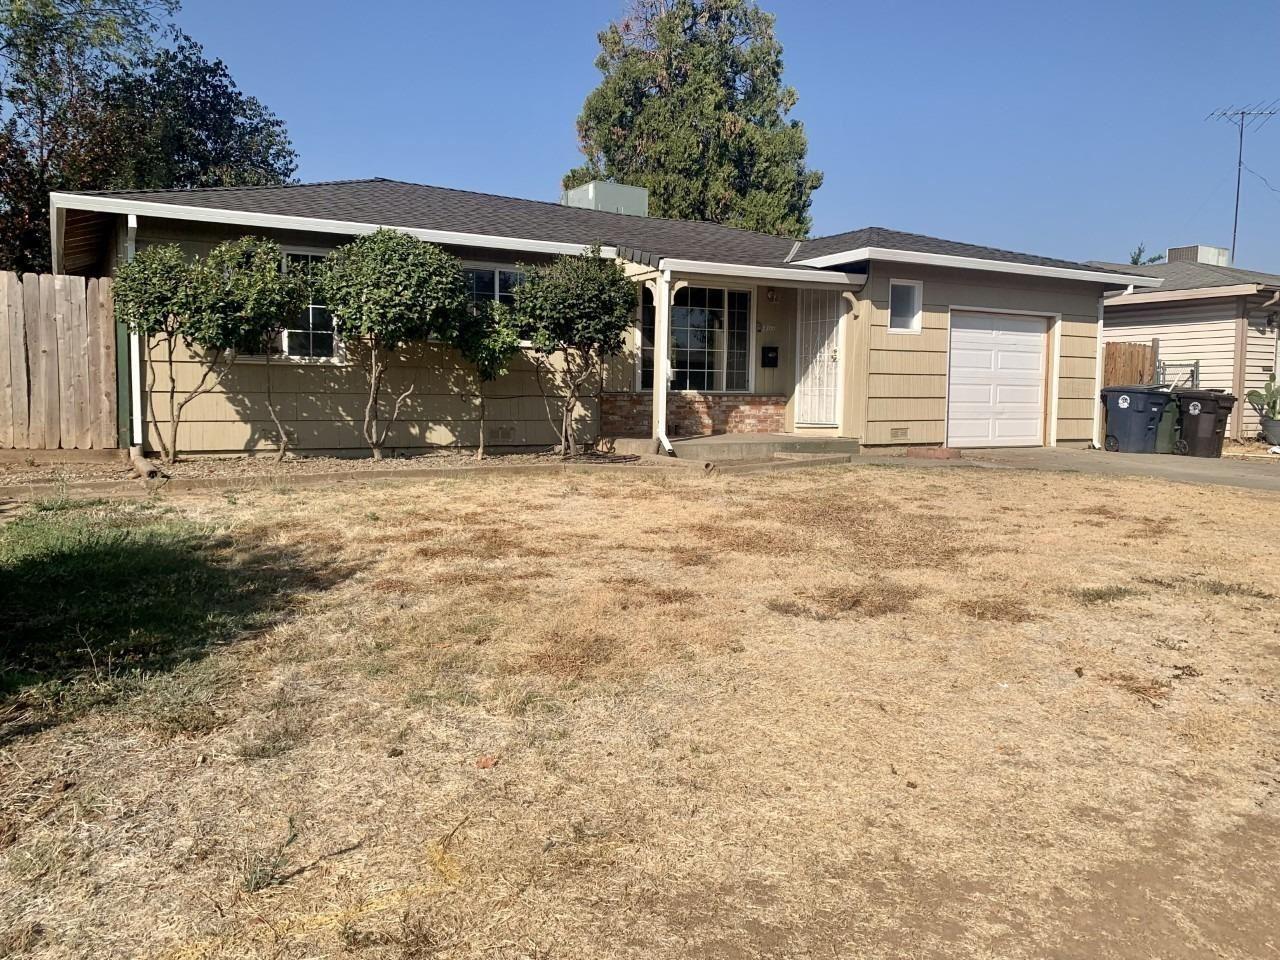 Photo of 2700 Ribier Way, Rancho Cordova, CA 95670 (MLS # 221110828)